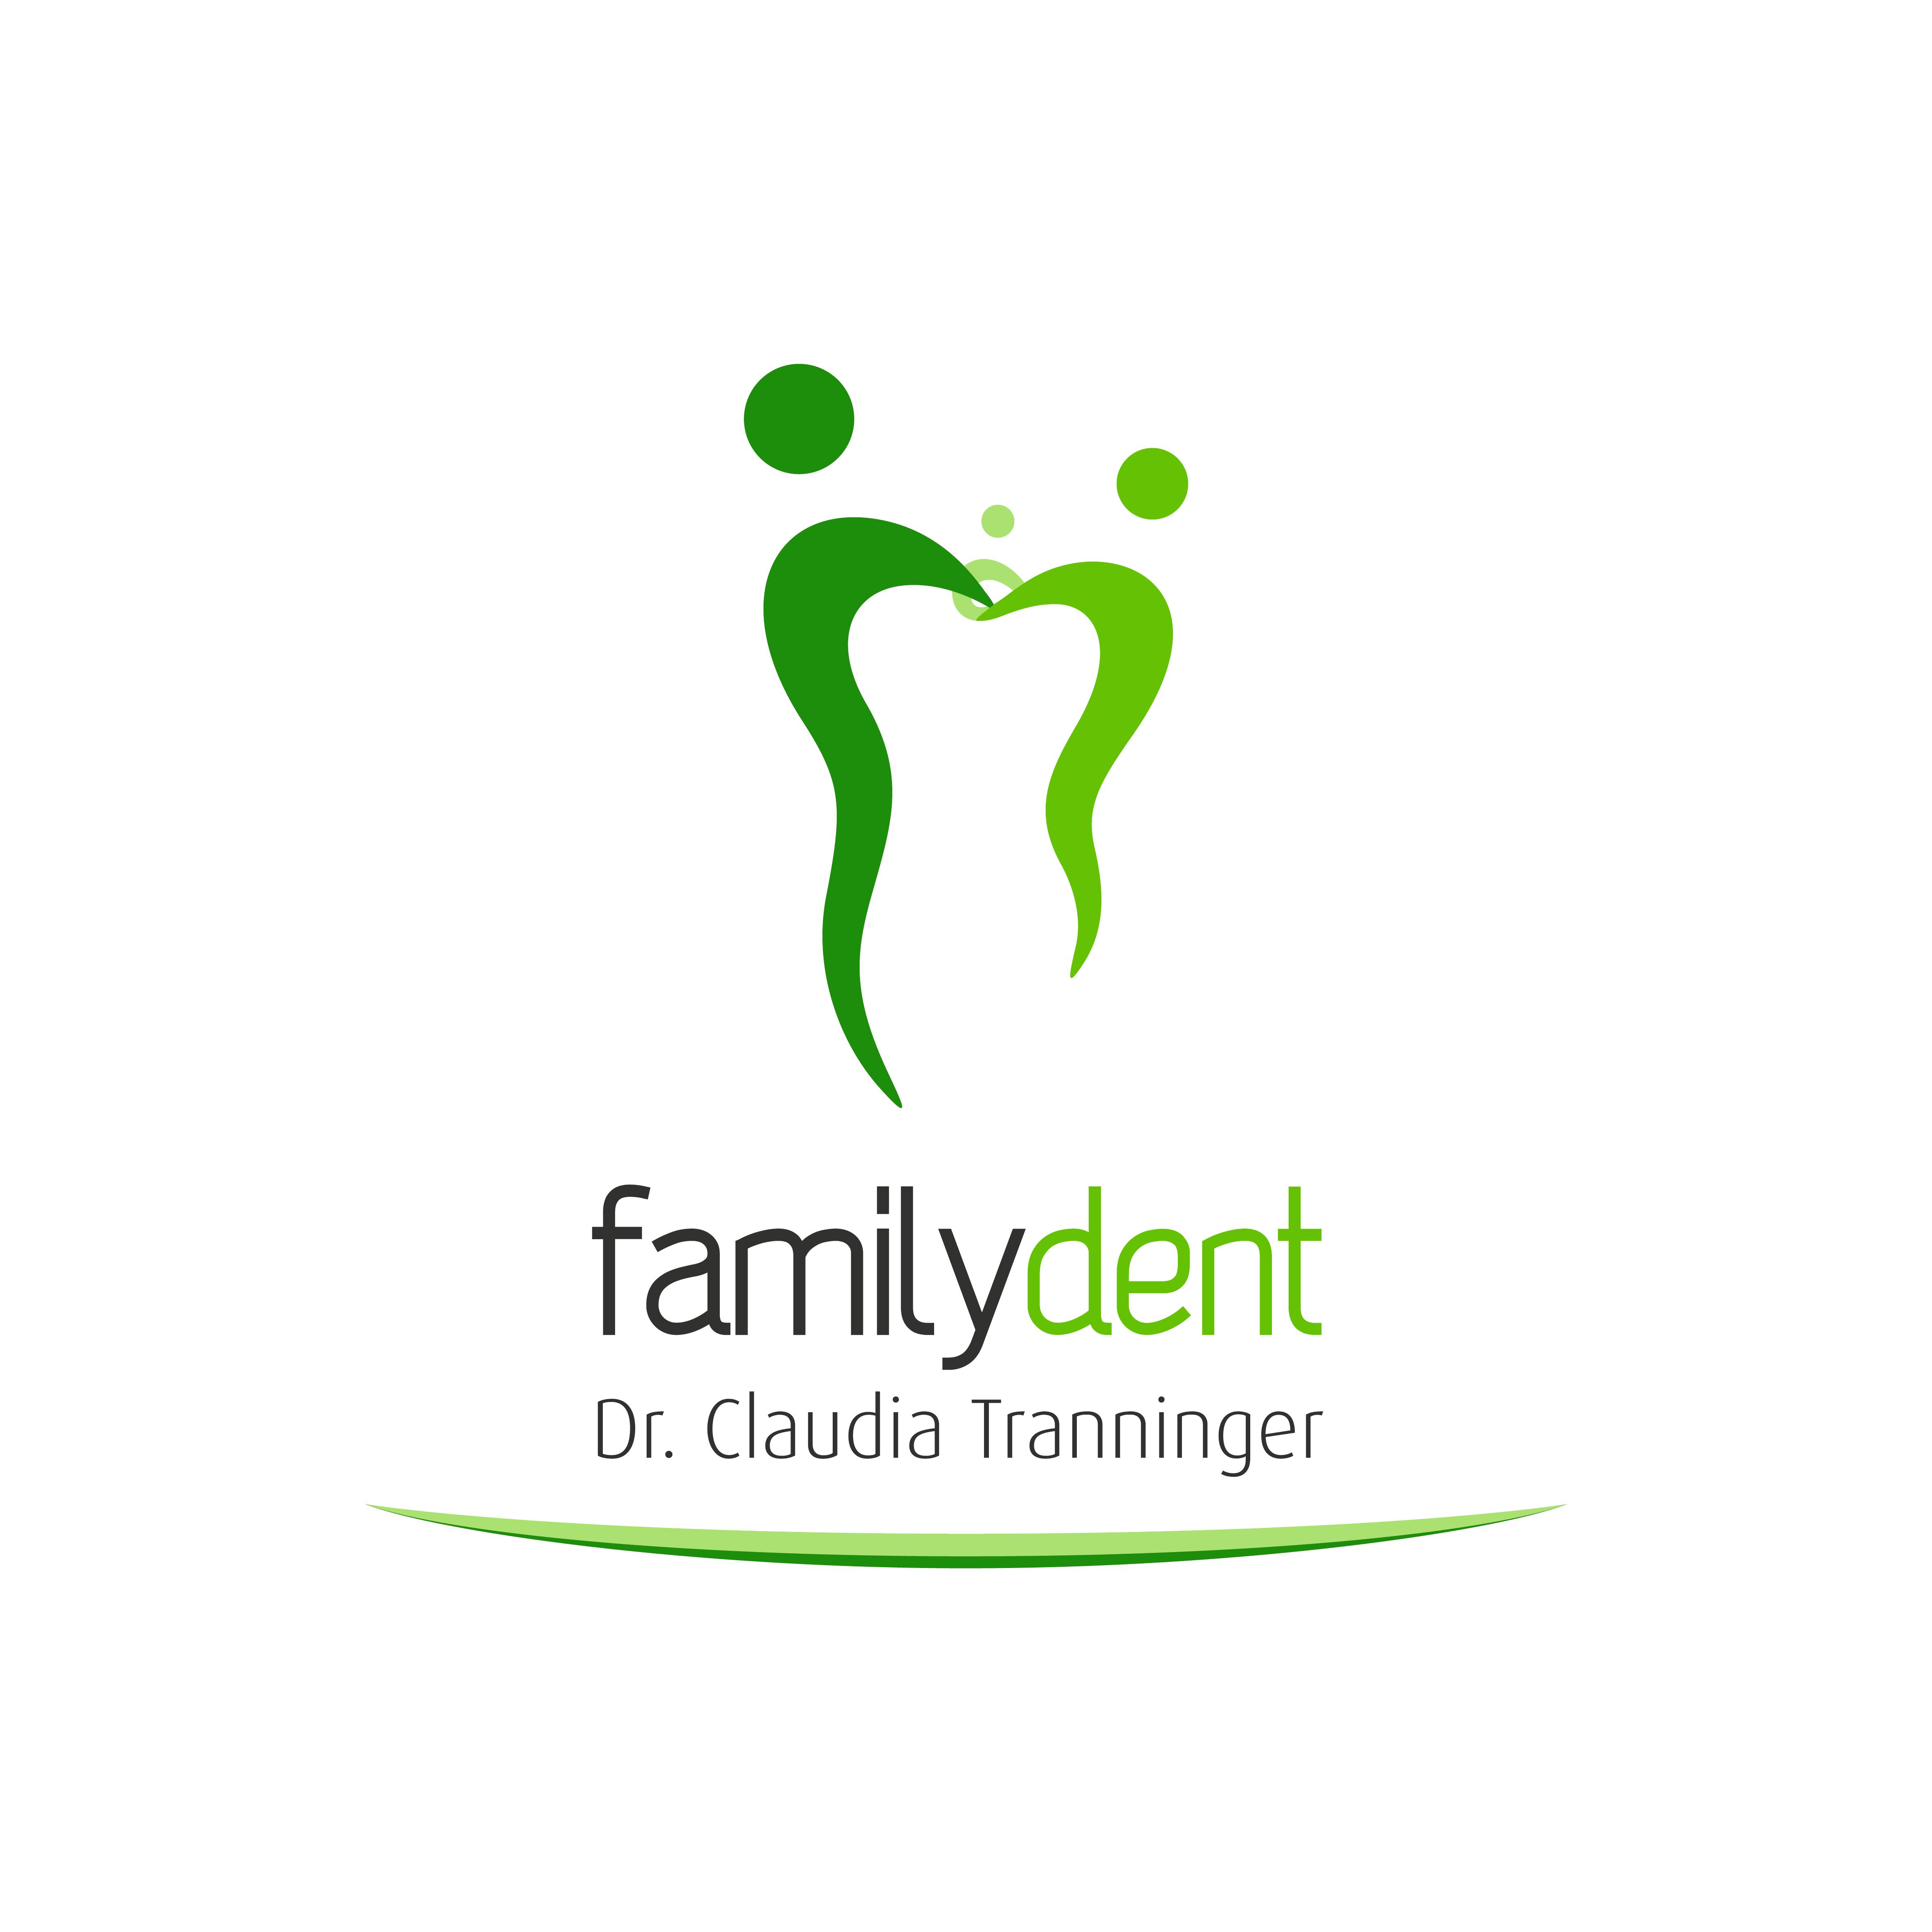 Zahnarztpraxis Familydent - Dr. Claudia Tranninger Logo